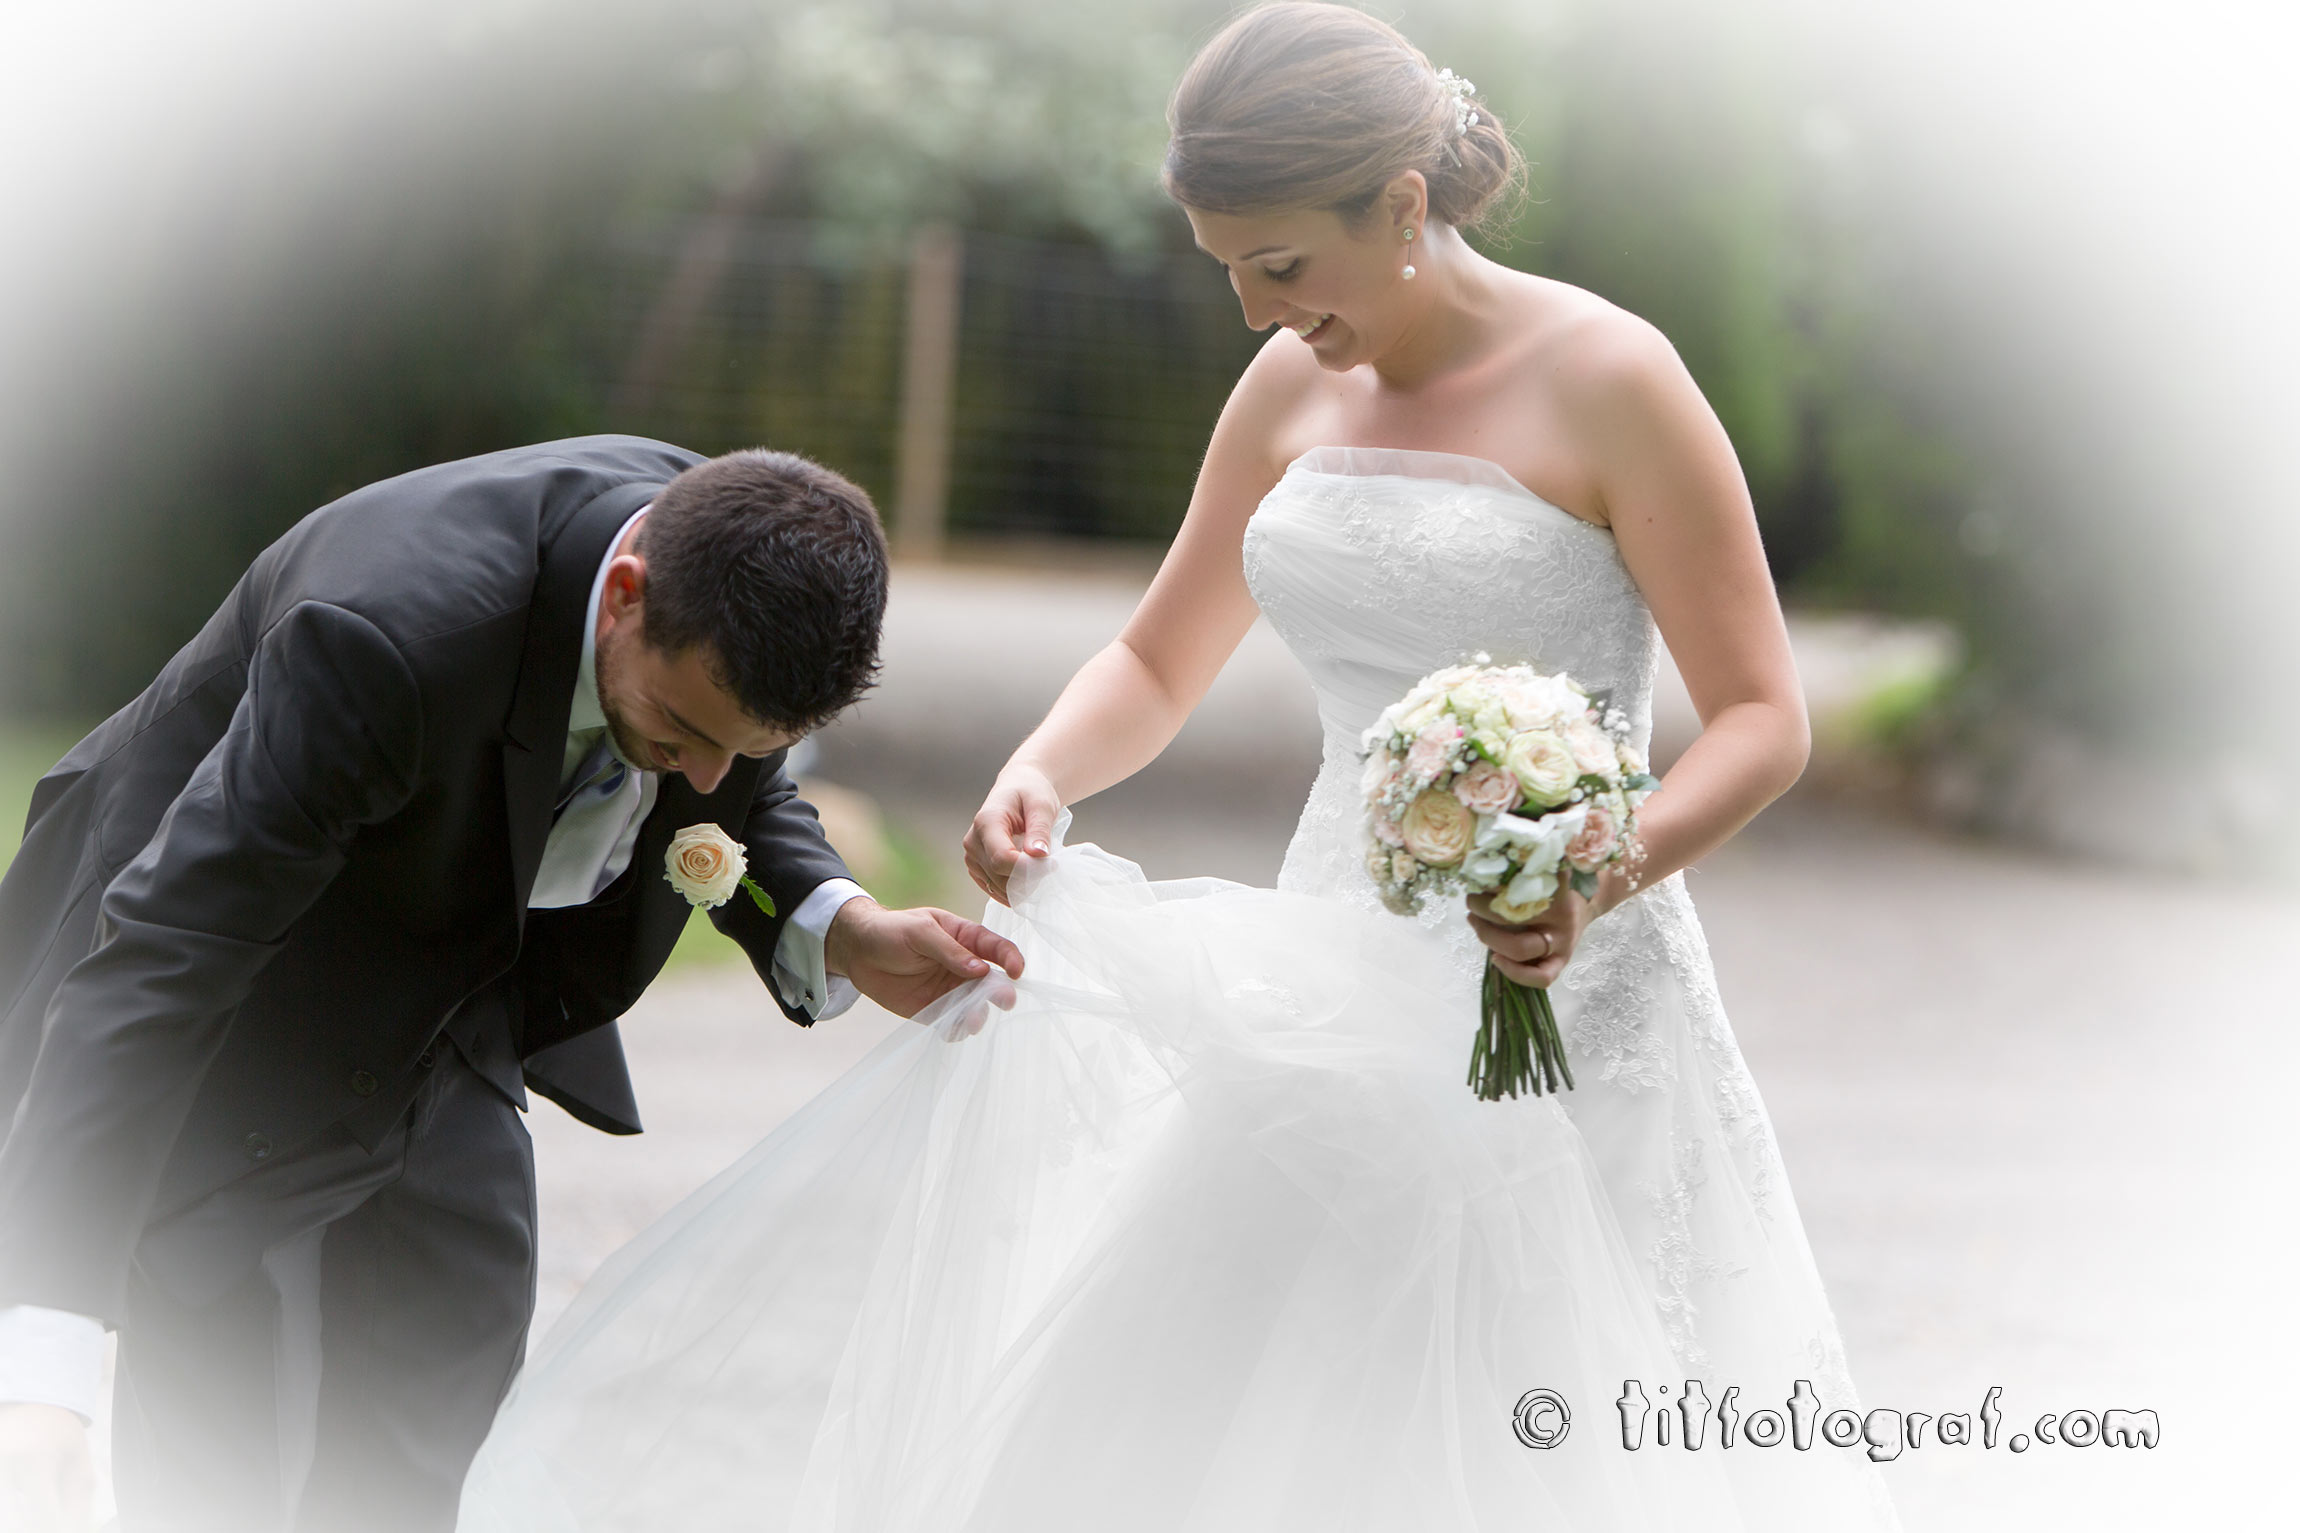 Casament, passeig de nuvis